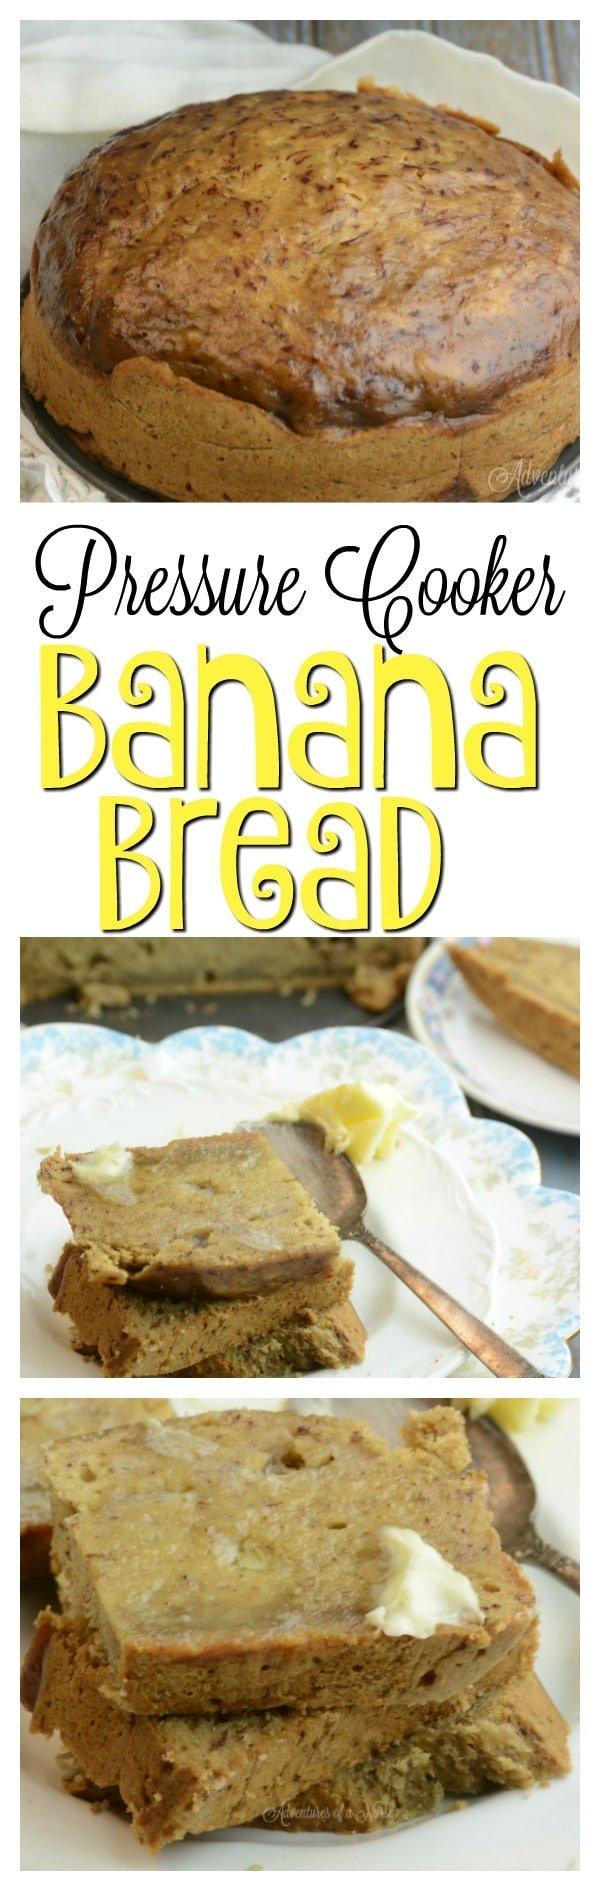 PRESSURE COOKER BANANA BREAD